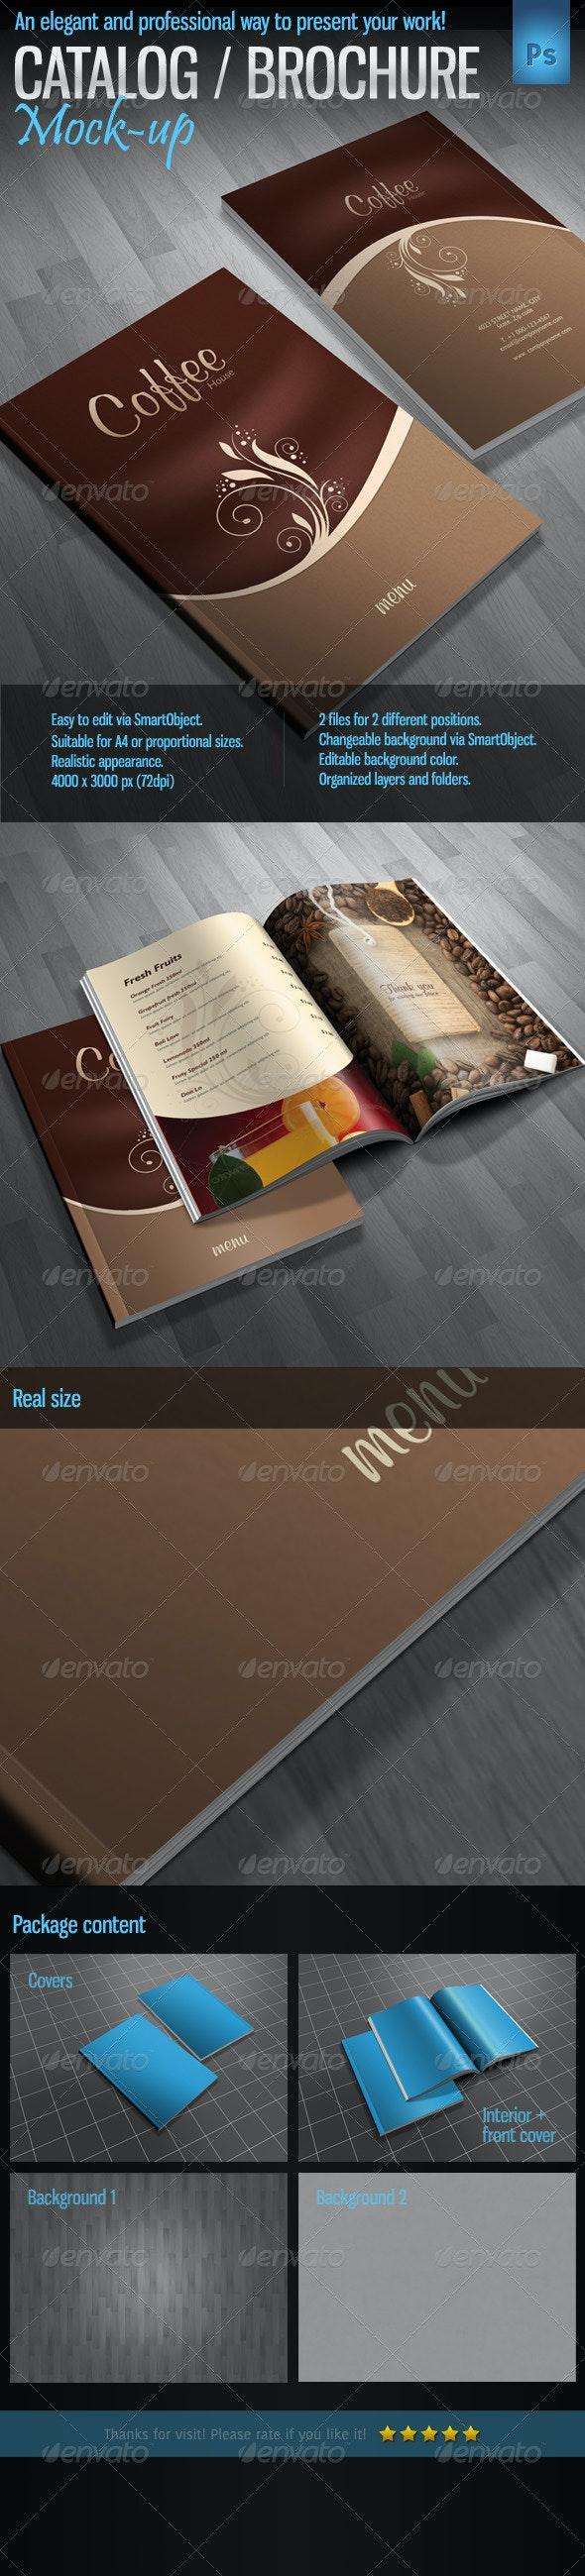 Brochure / Catalog / Magazine Mock-Up - Product Mock-Ups Graphics